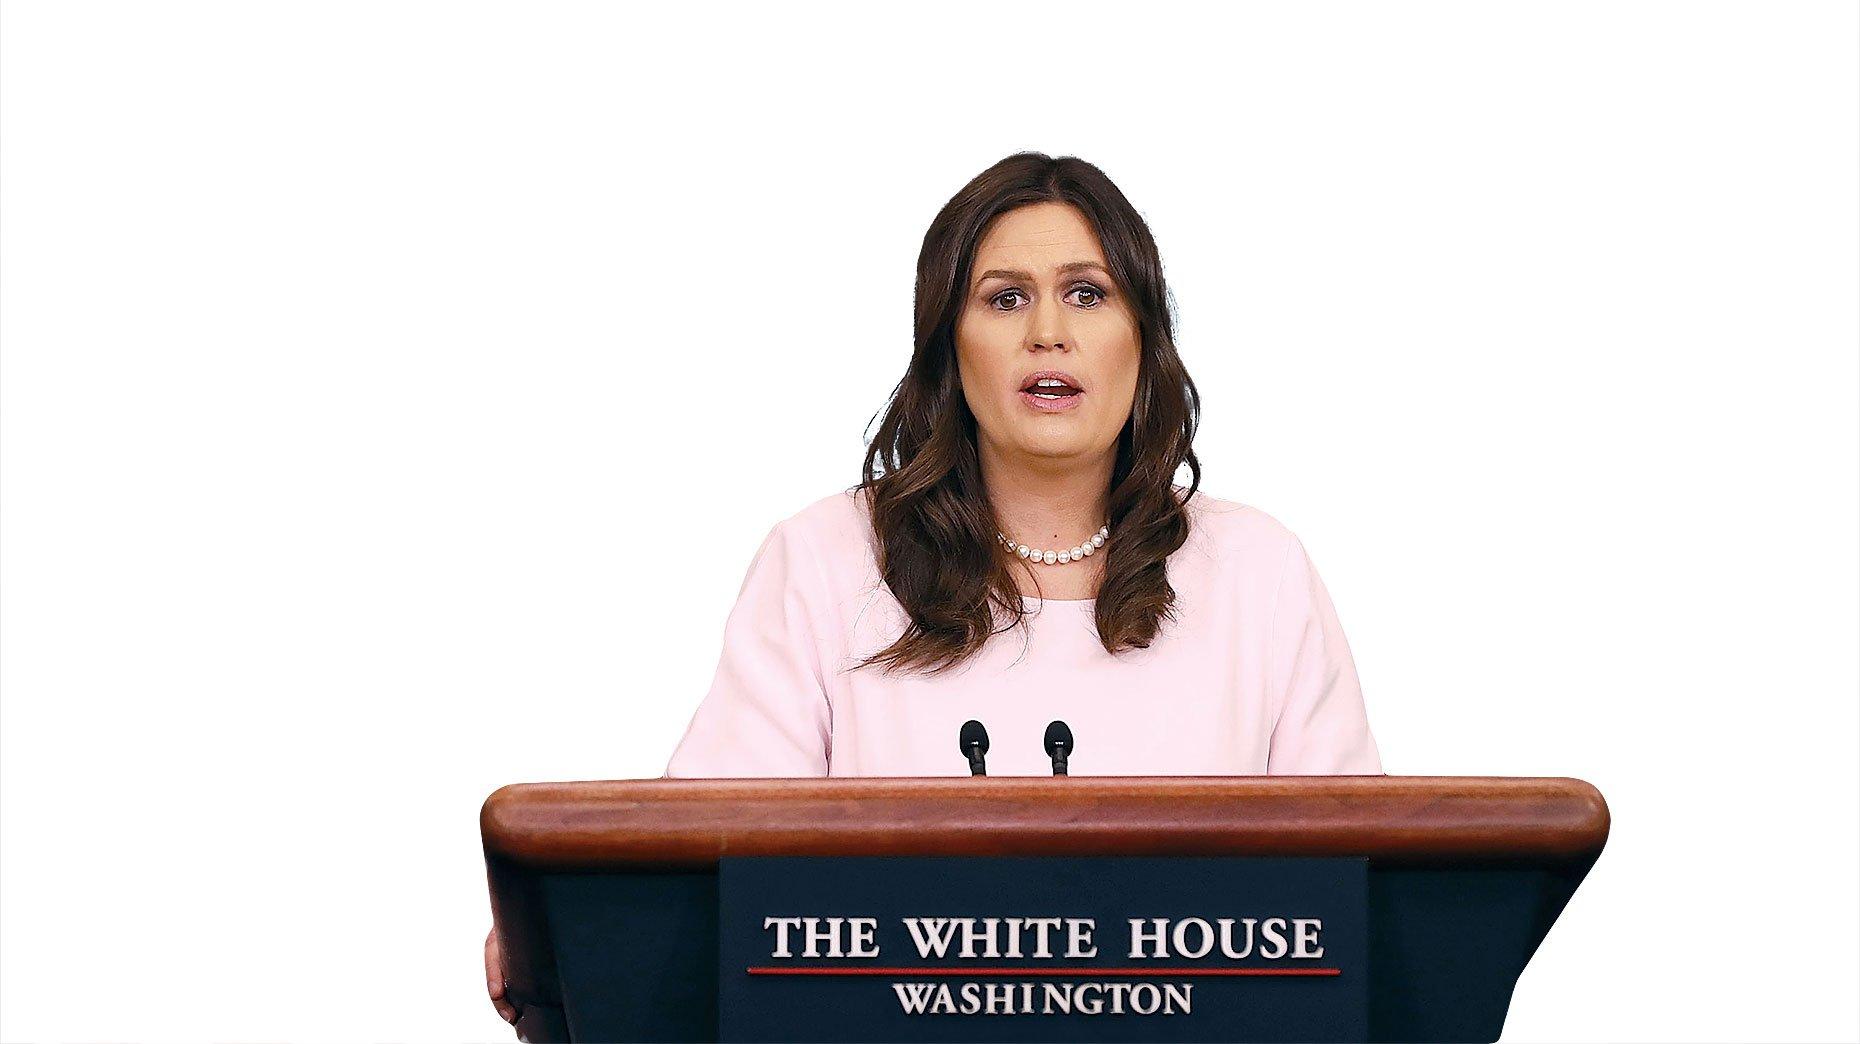 Ex-White House Press Secretaries' Current Jobs, Ranked